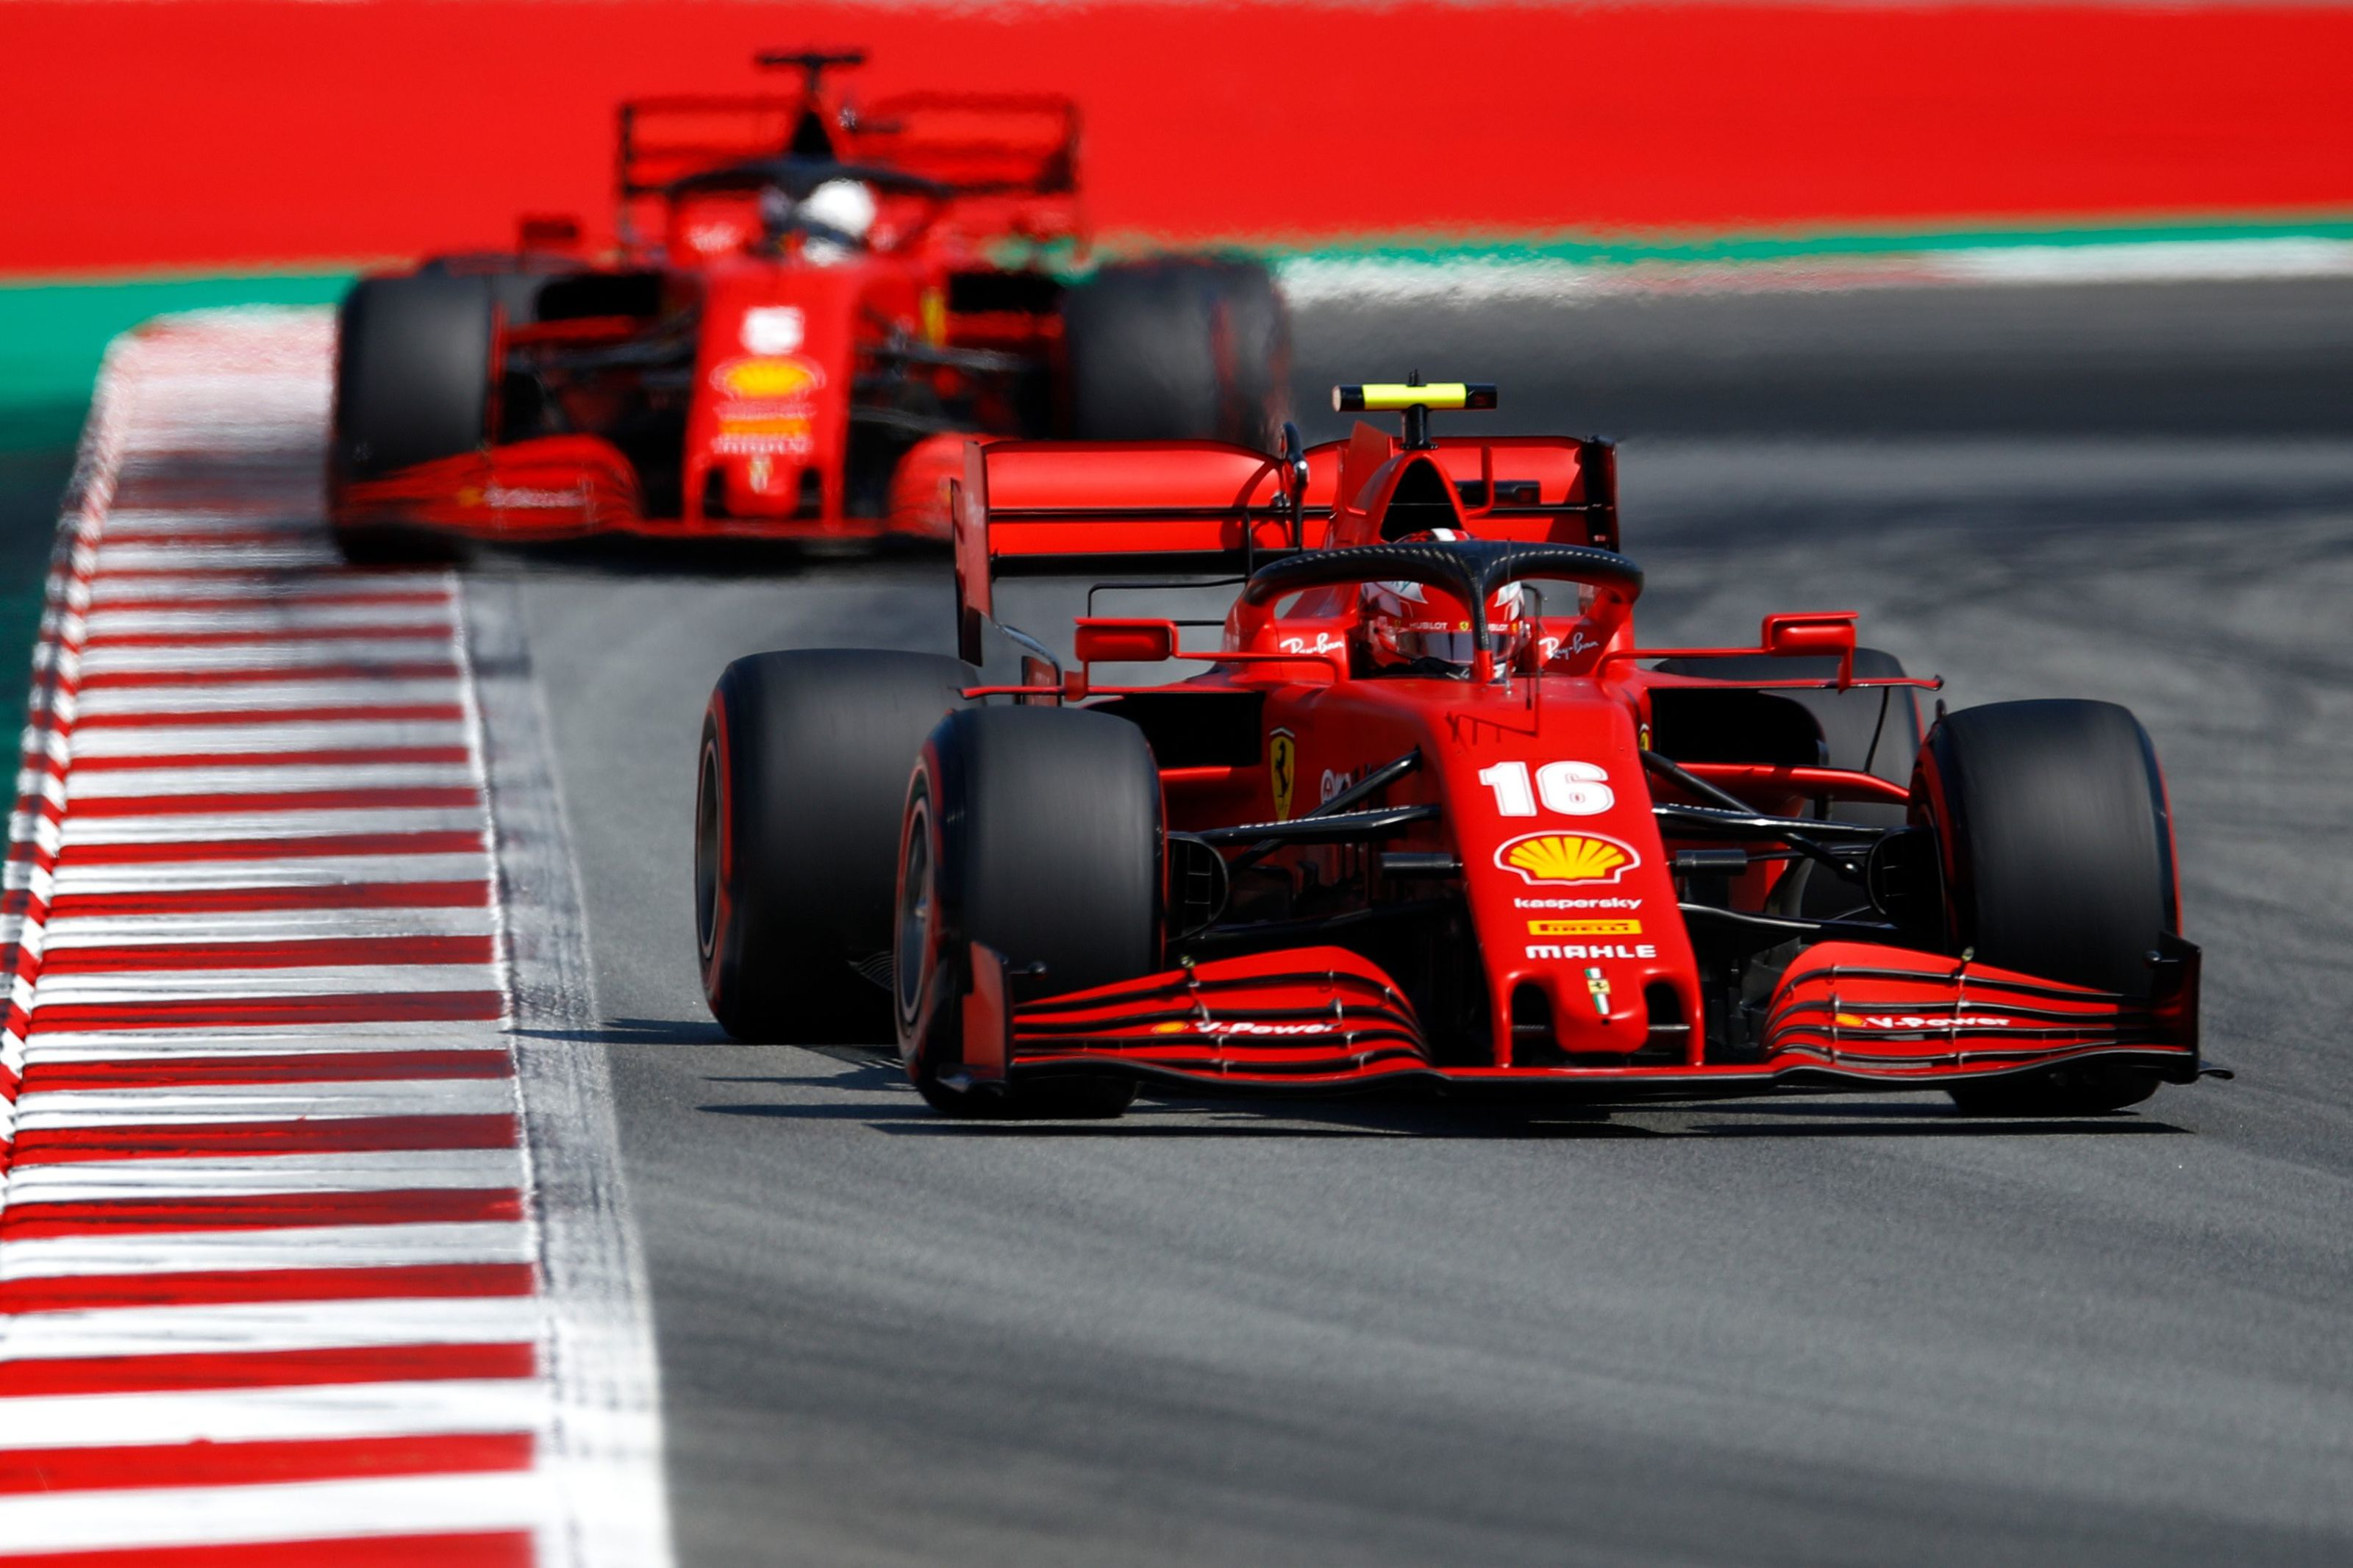 Formula 1 Ferrari S Horrible Season Could Have Historic Implications